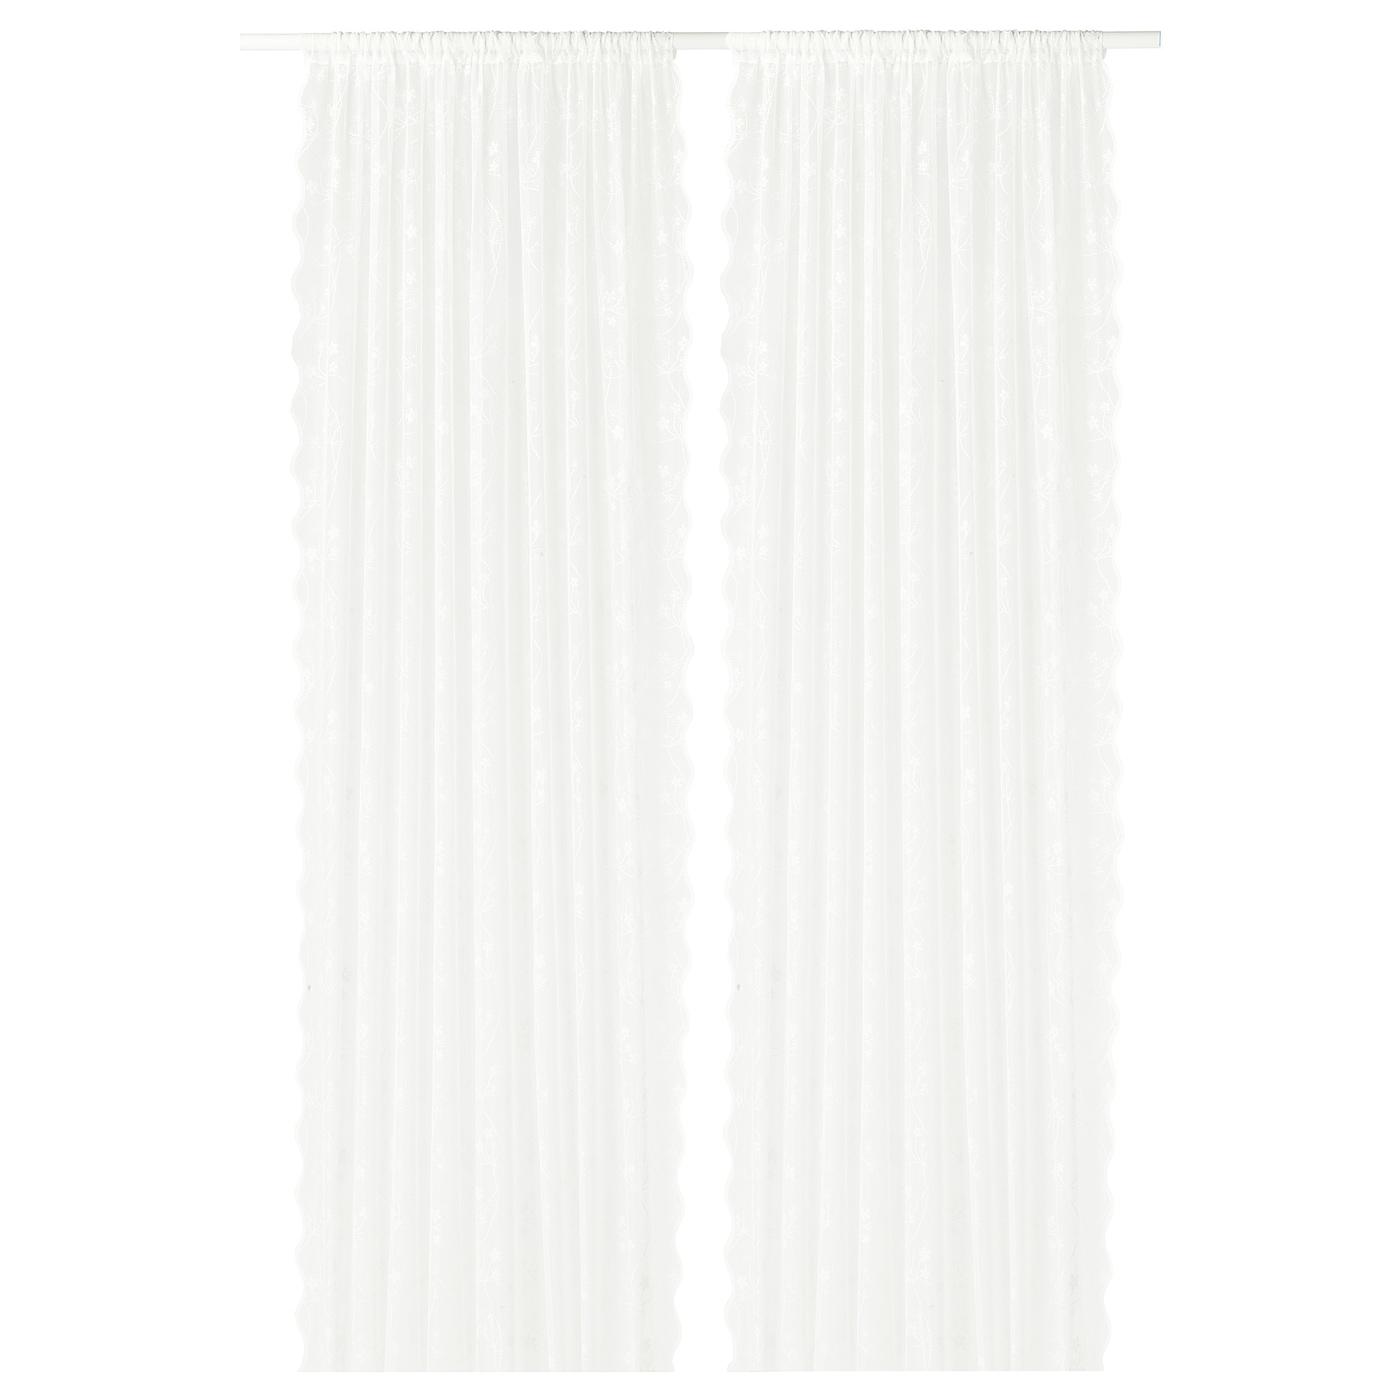 osted tapis tiss plat naturel 212 x 300 cm ikea. Black Bedroom Furniture Sets. Home Design Ideas